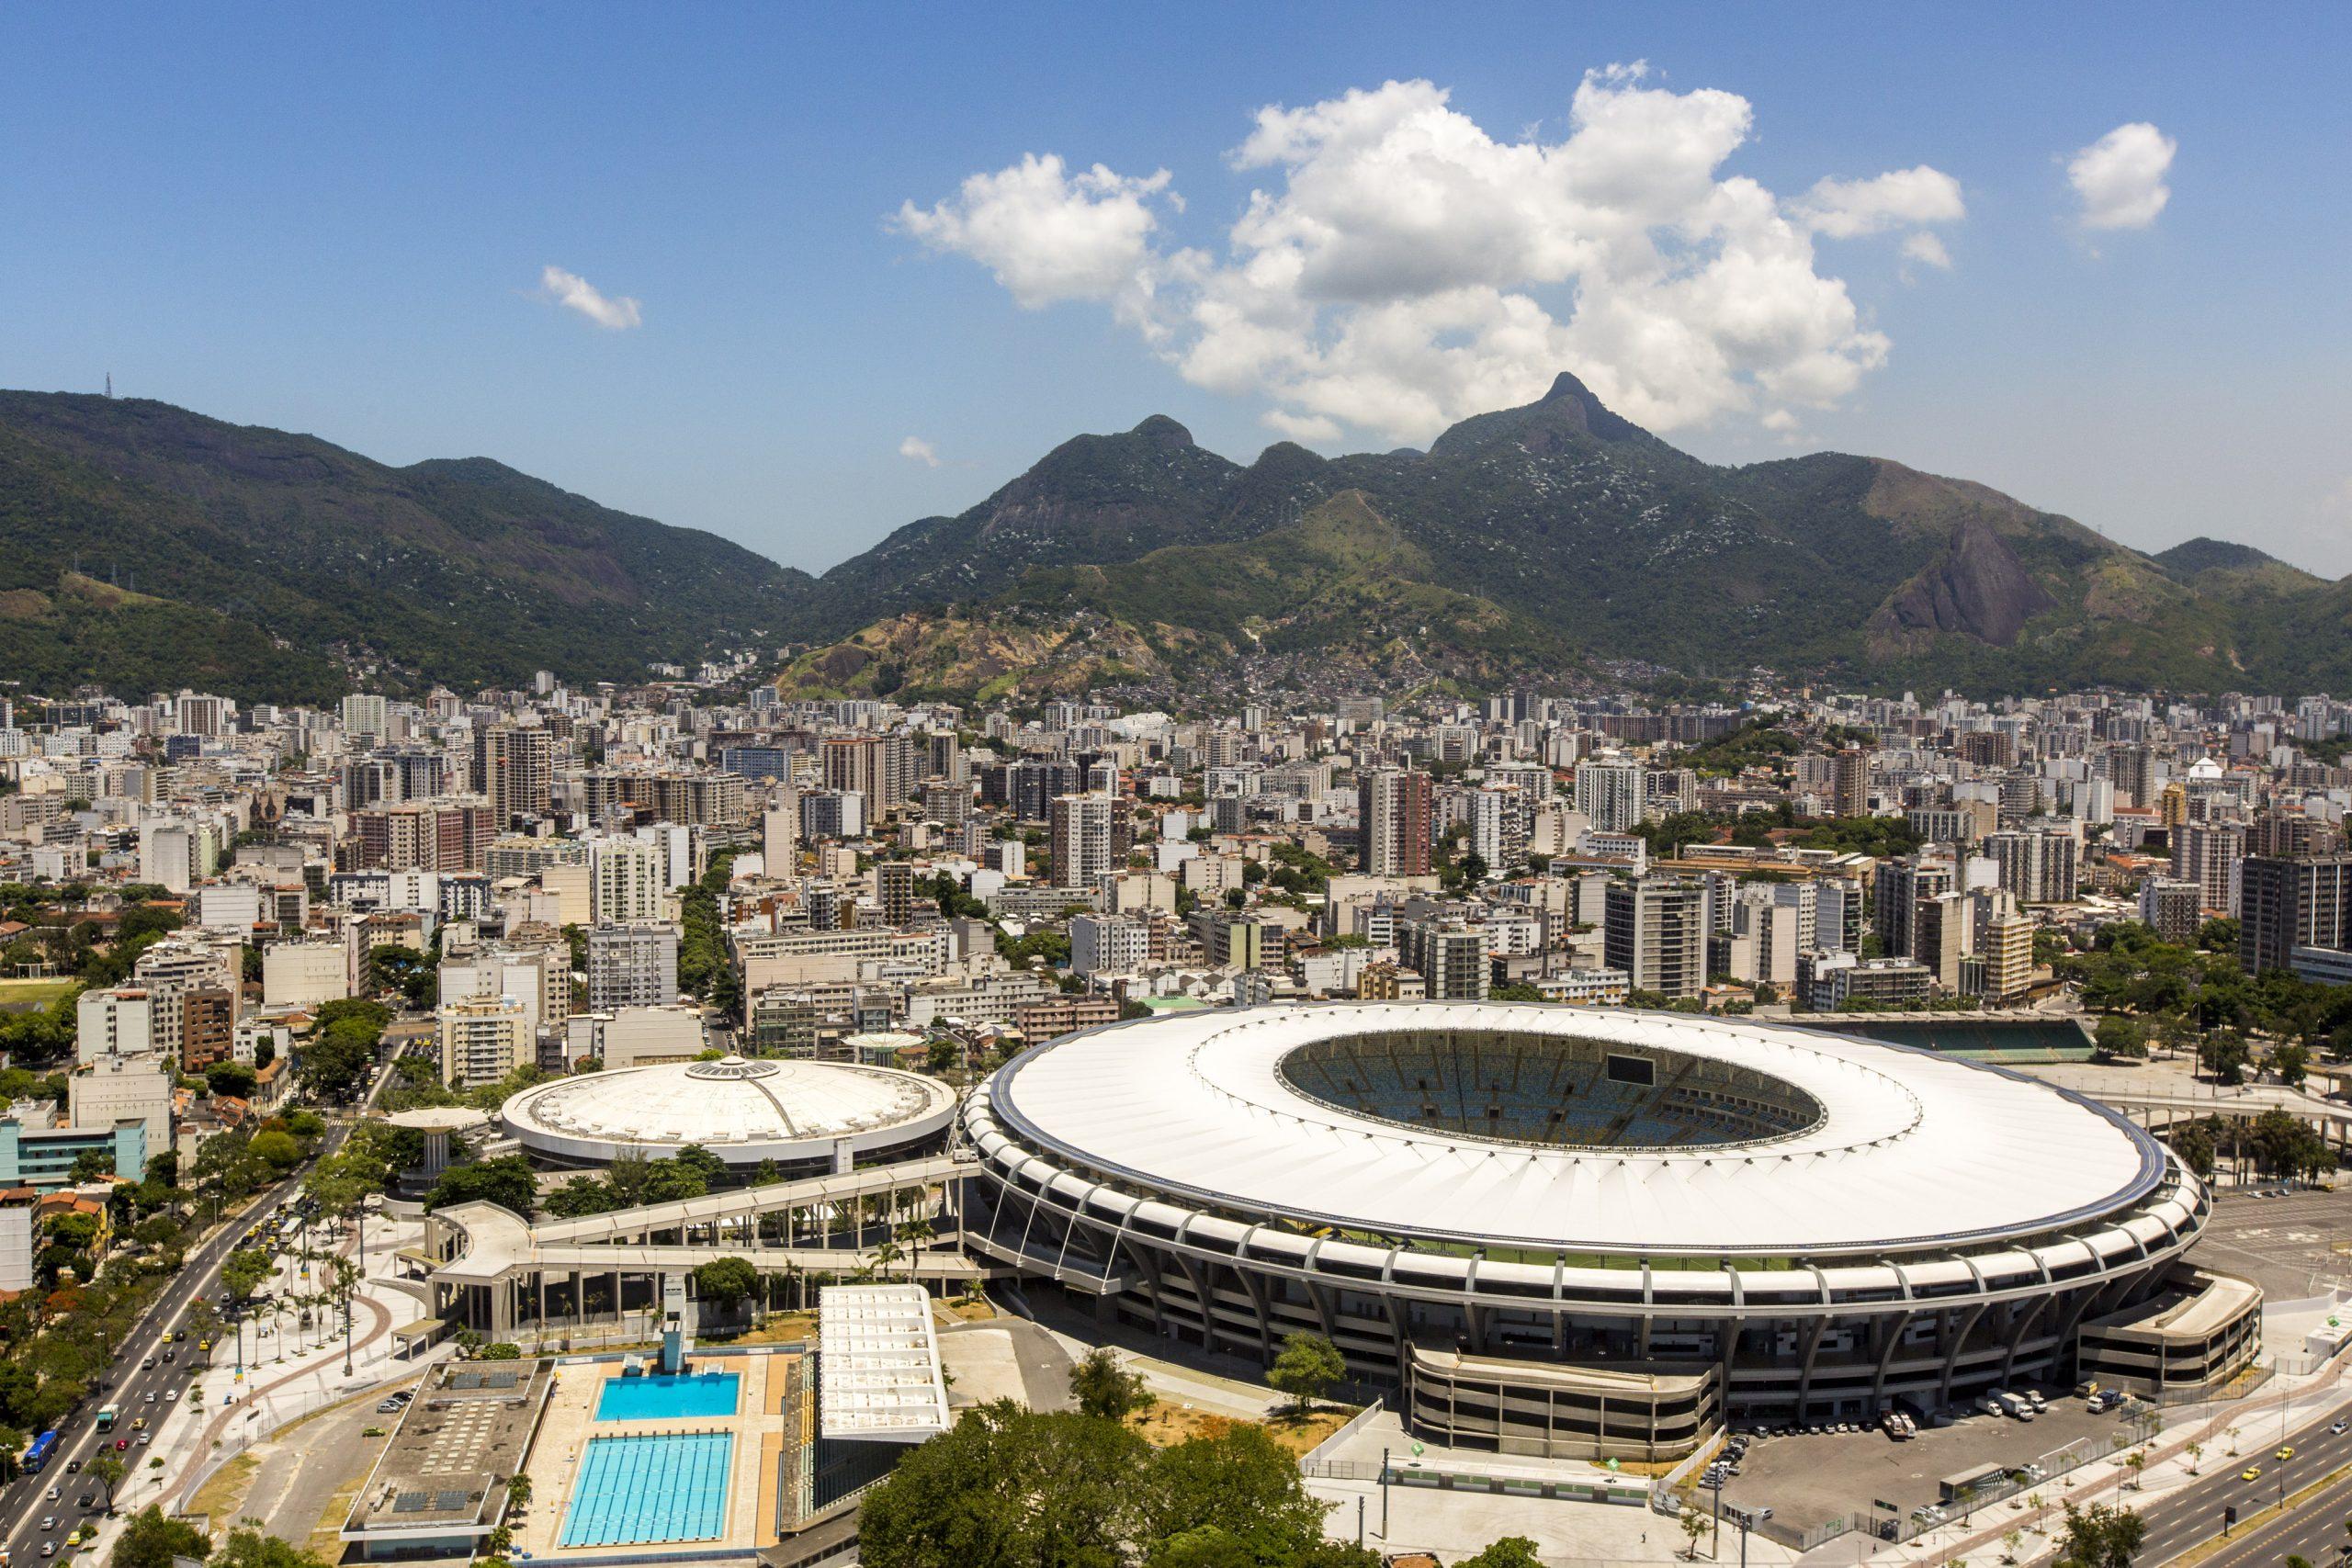 Maracanã Stadium will host the Copa America 2021 Argentina vs Brazil.